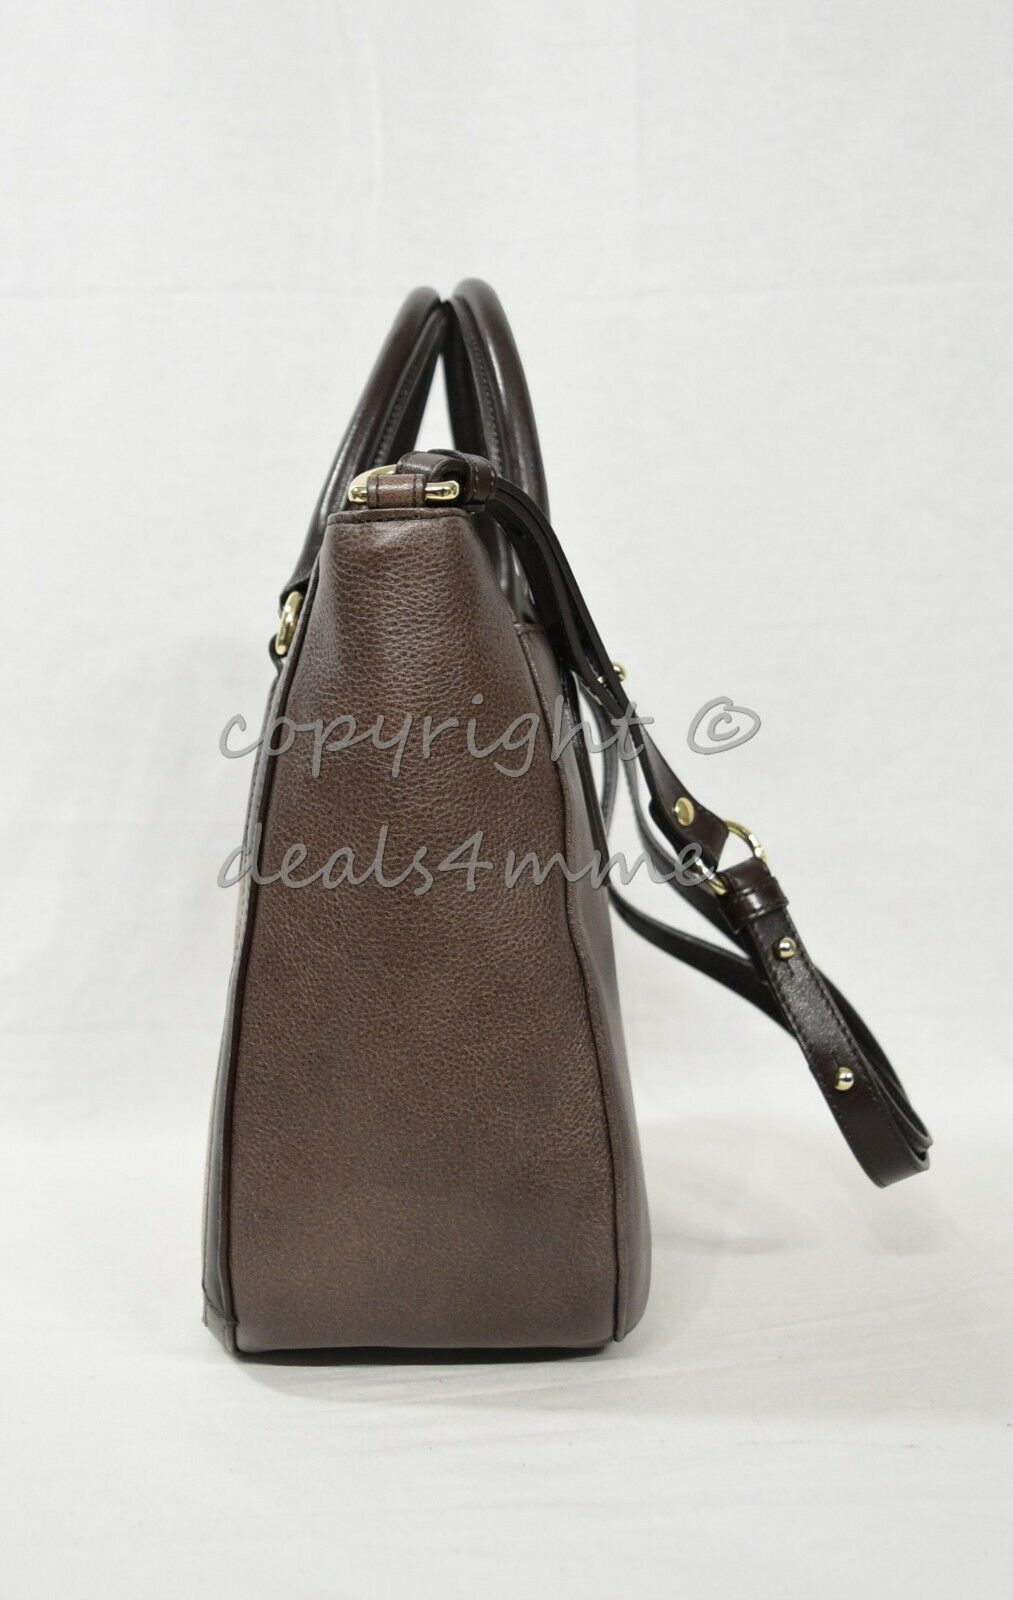 NWT Brahmin Small Lena Leather Satchel/Shoulder Bag in Brown Barrow image 8